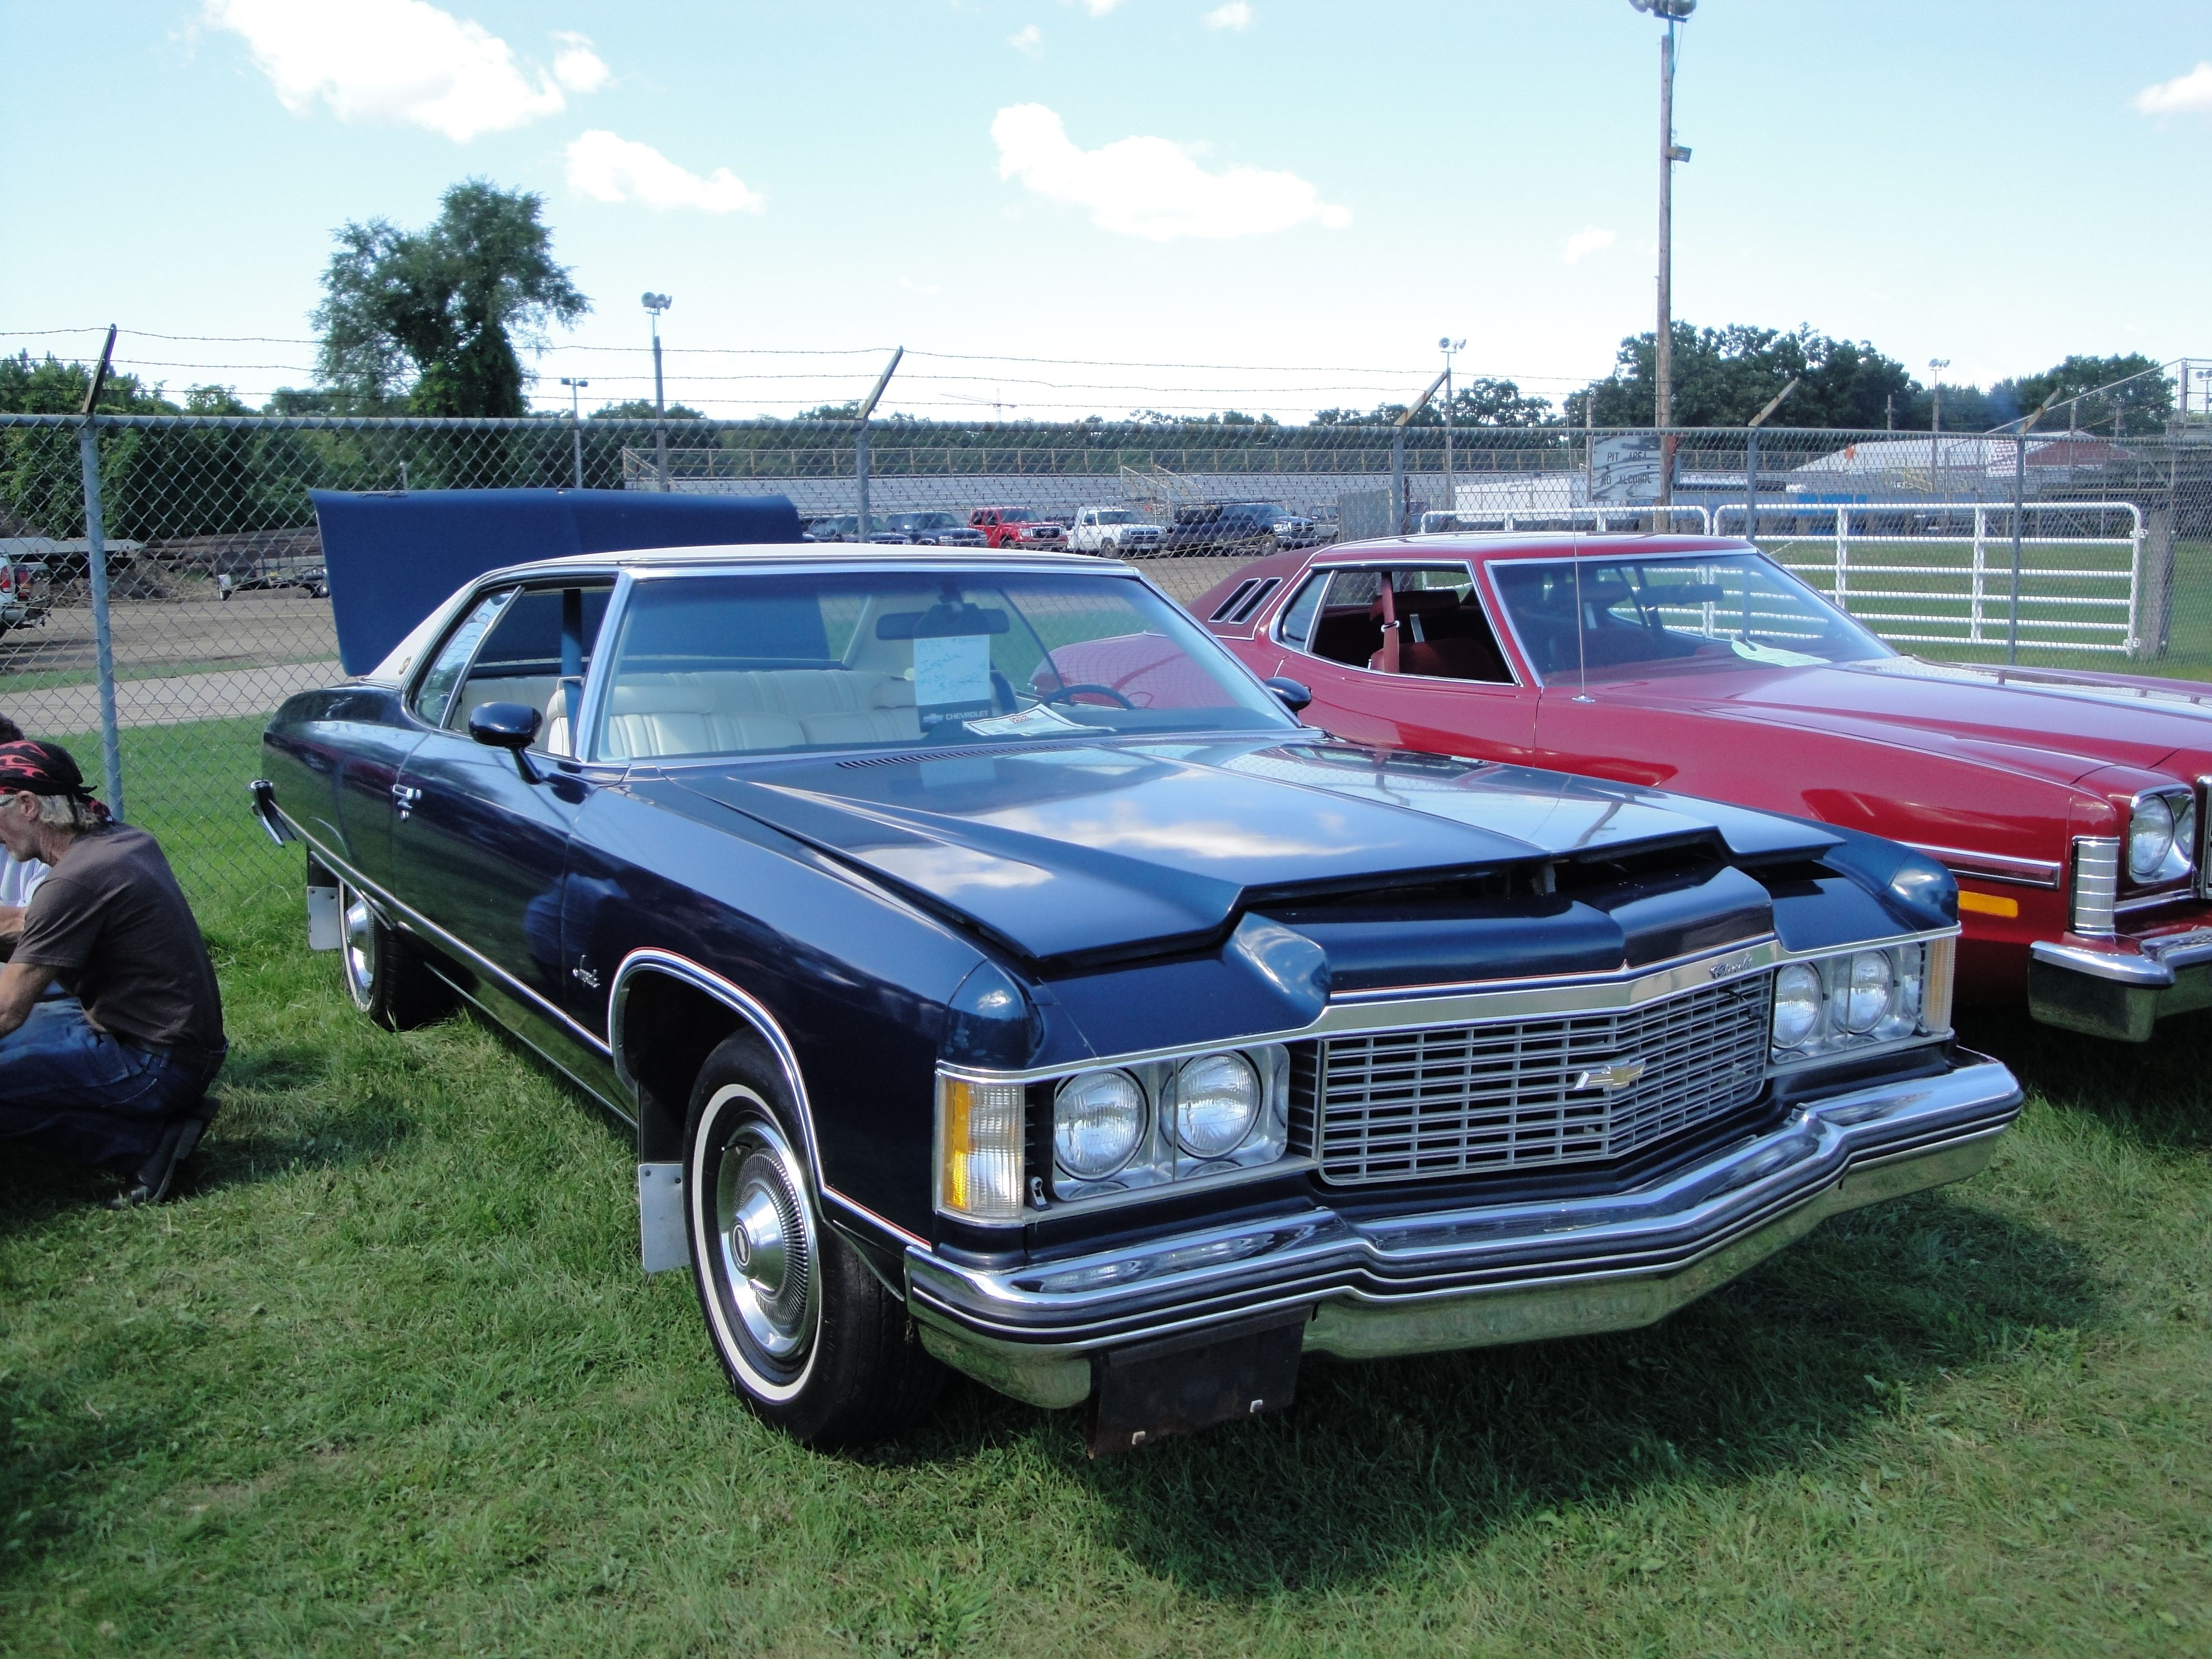 hight resolution of 1974 chevrolet impala spirit of america edition